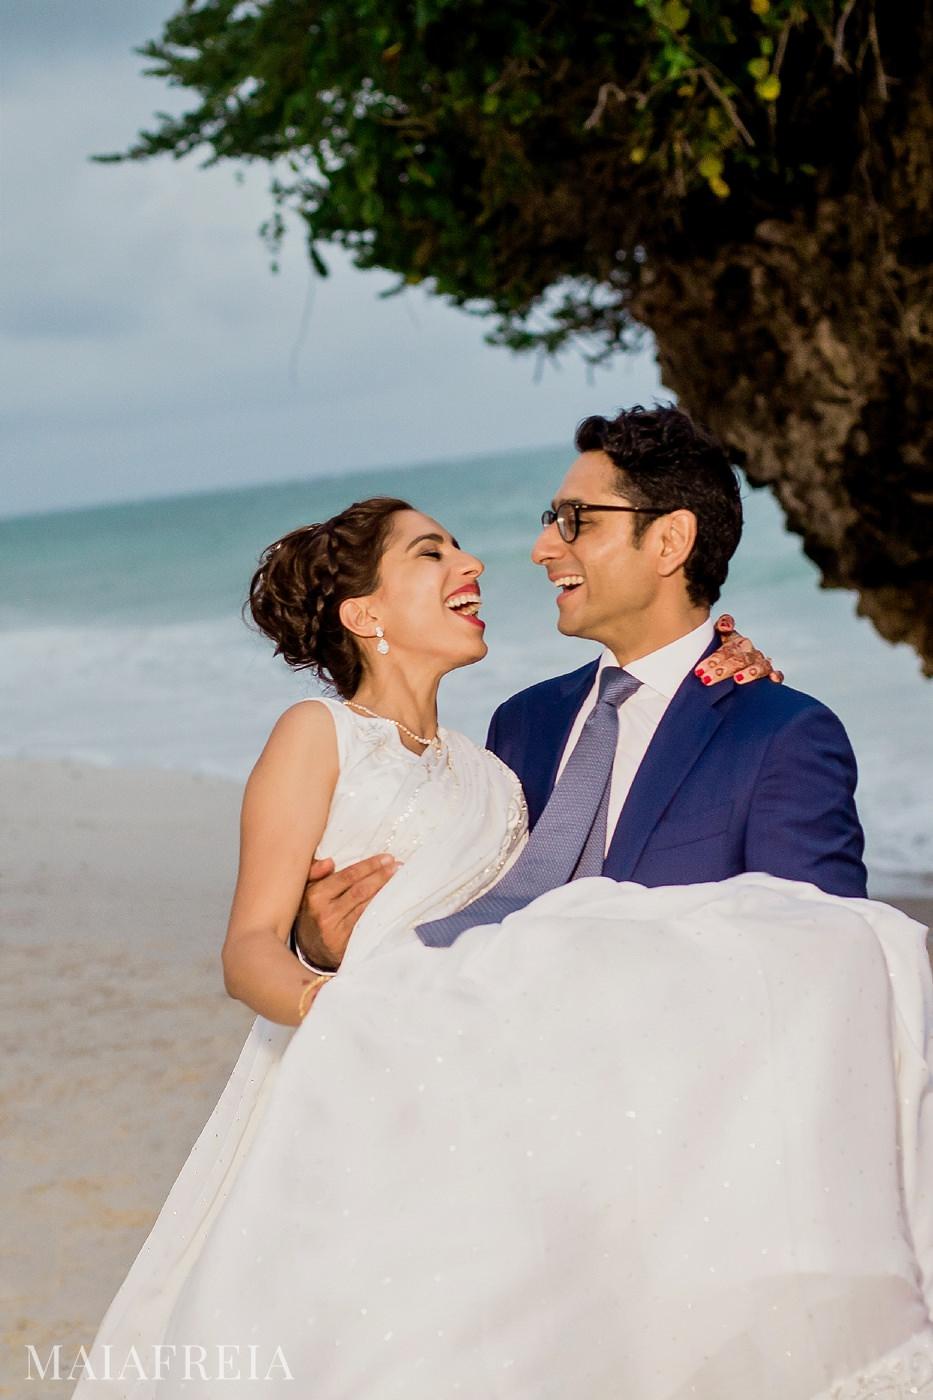 Leopard_Beach_Diani_Wedding_by_maiafreia_0072.jpg